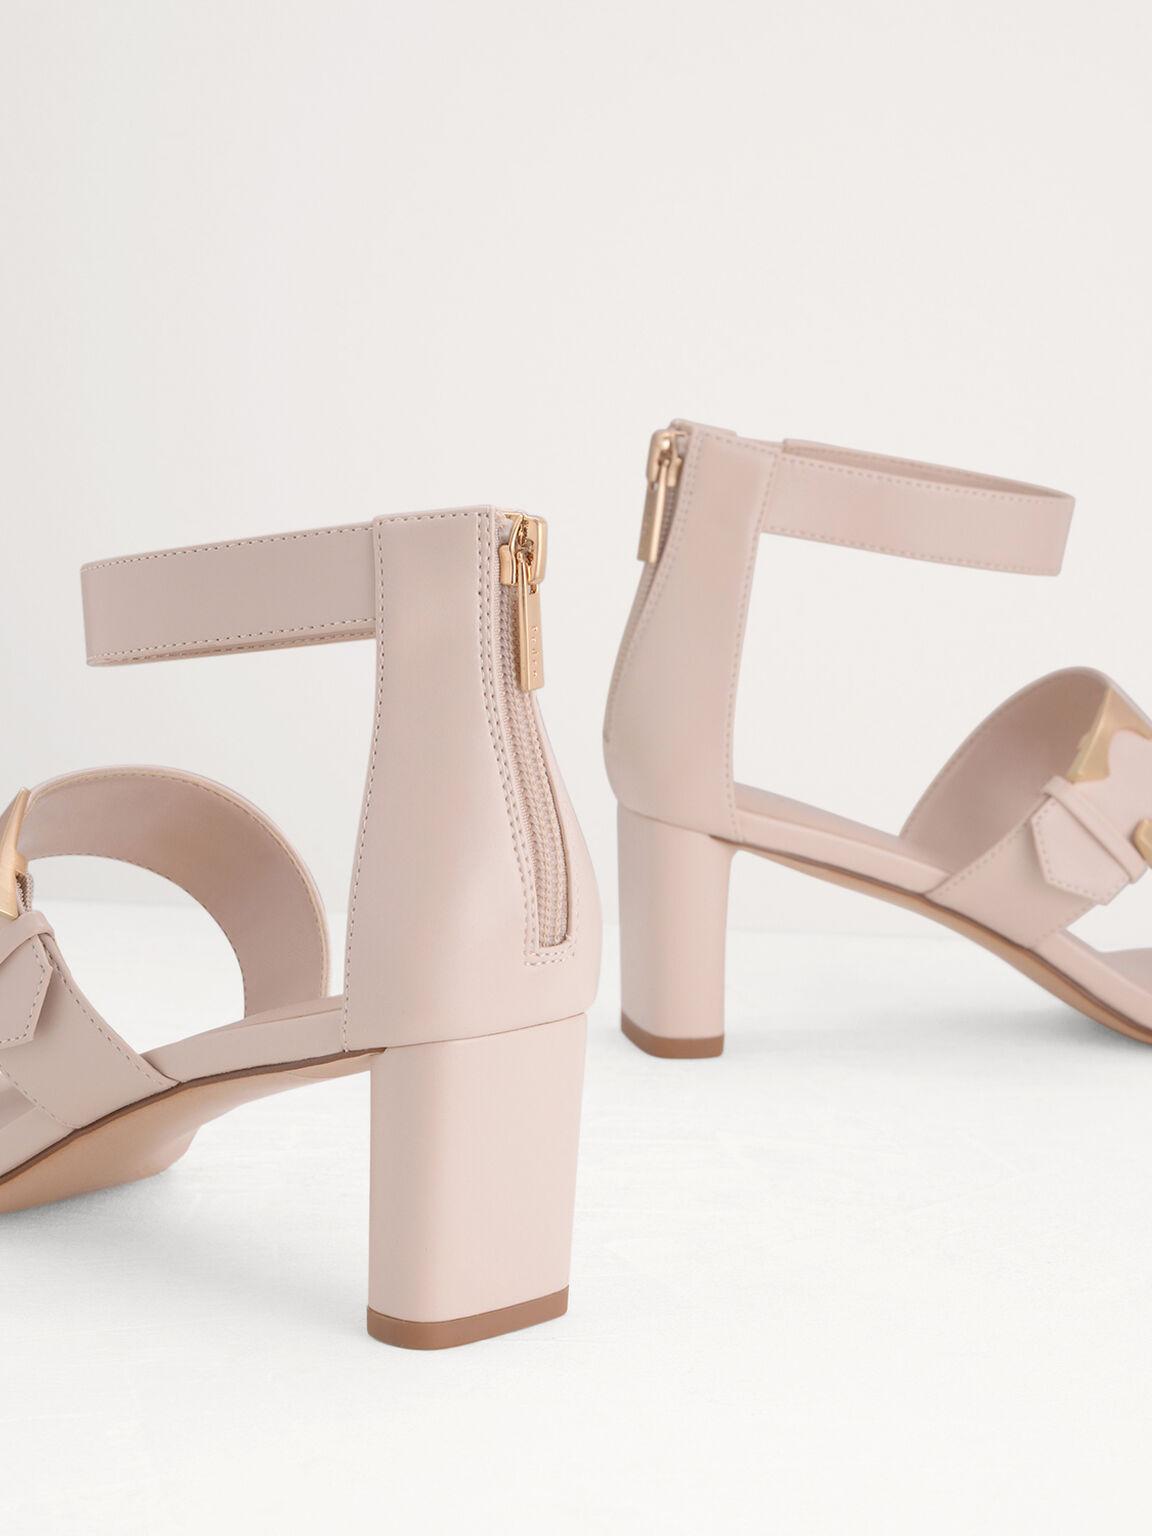 Geometric Buckle Heeled Sandals, Cream, hi-res